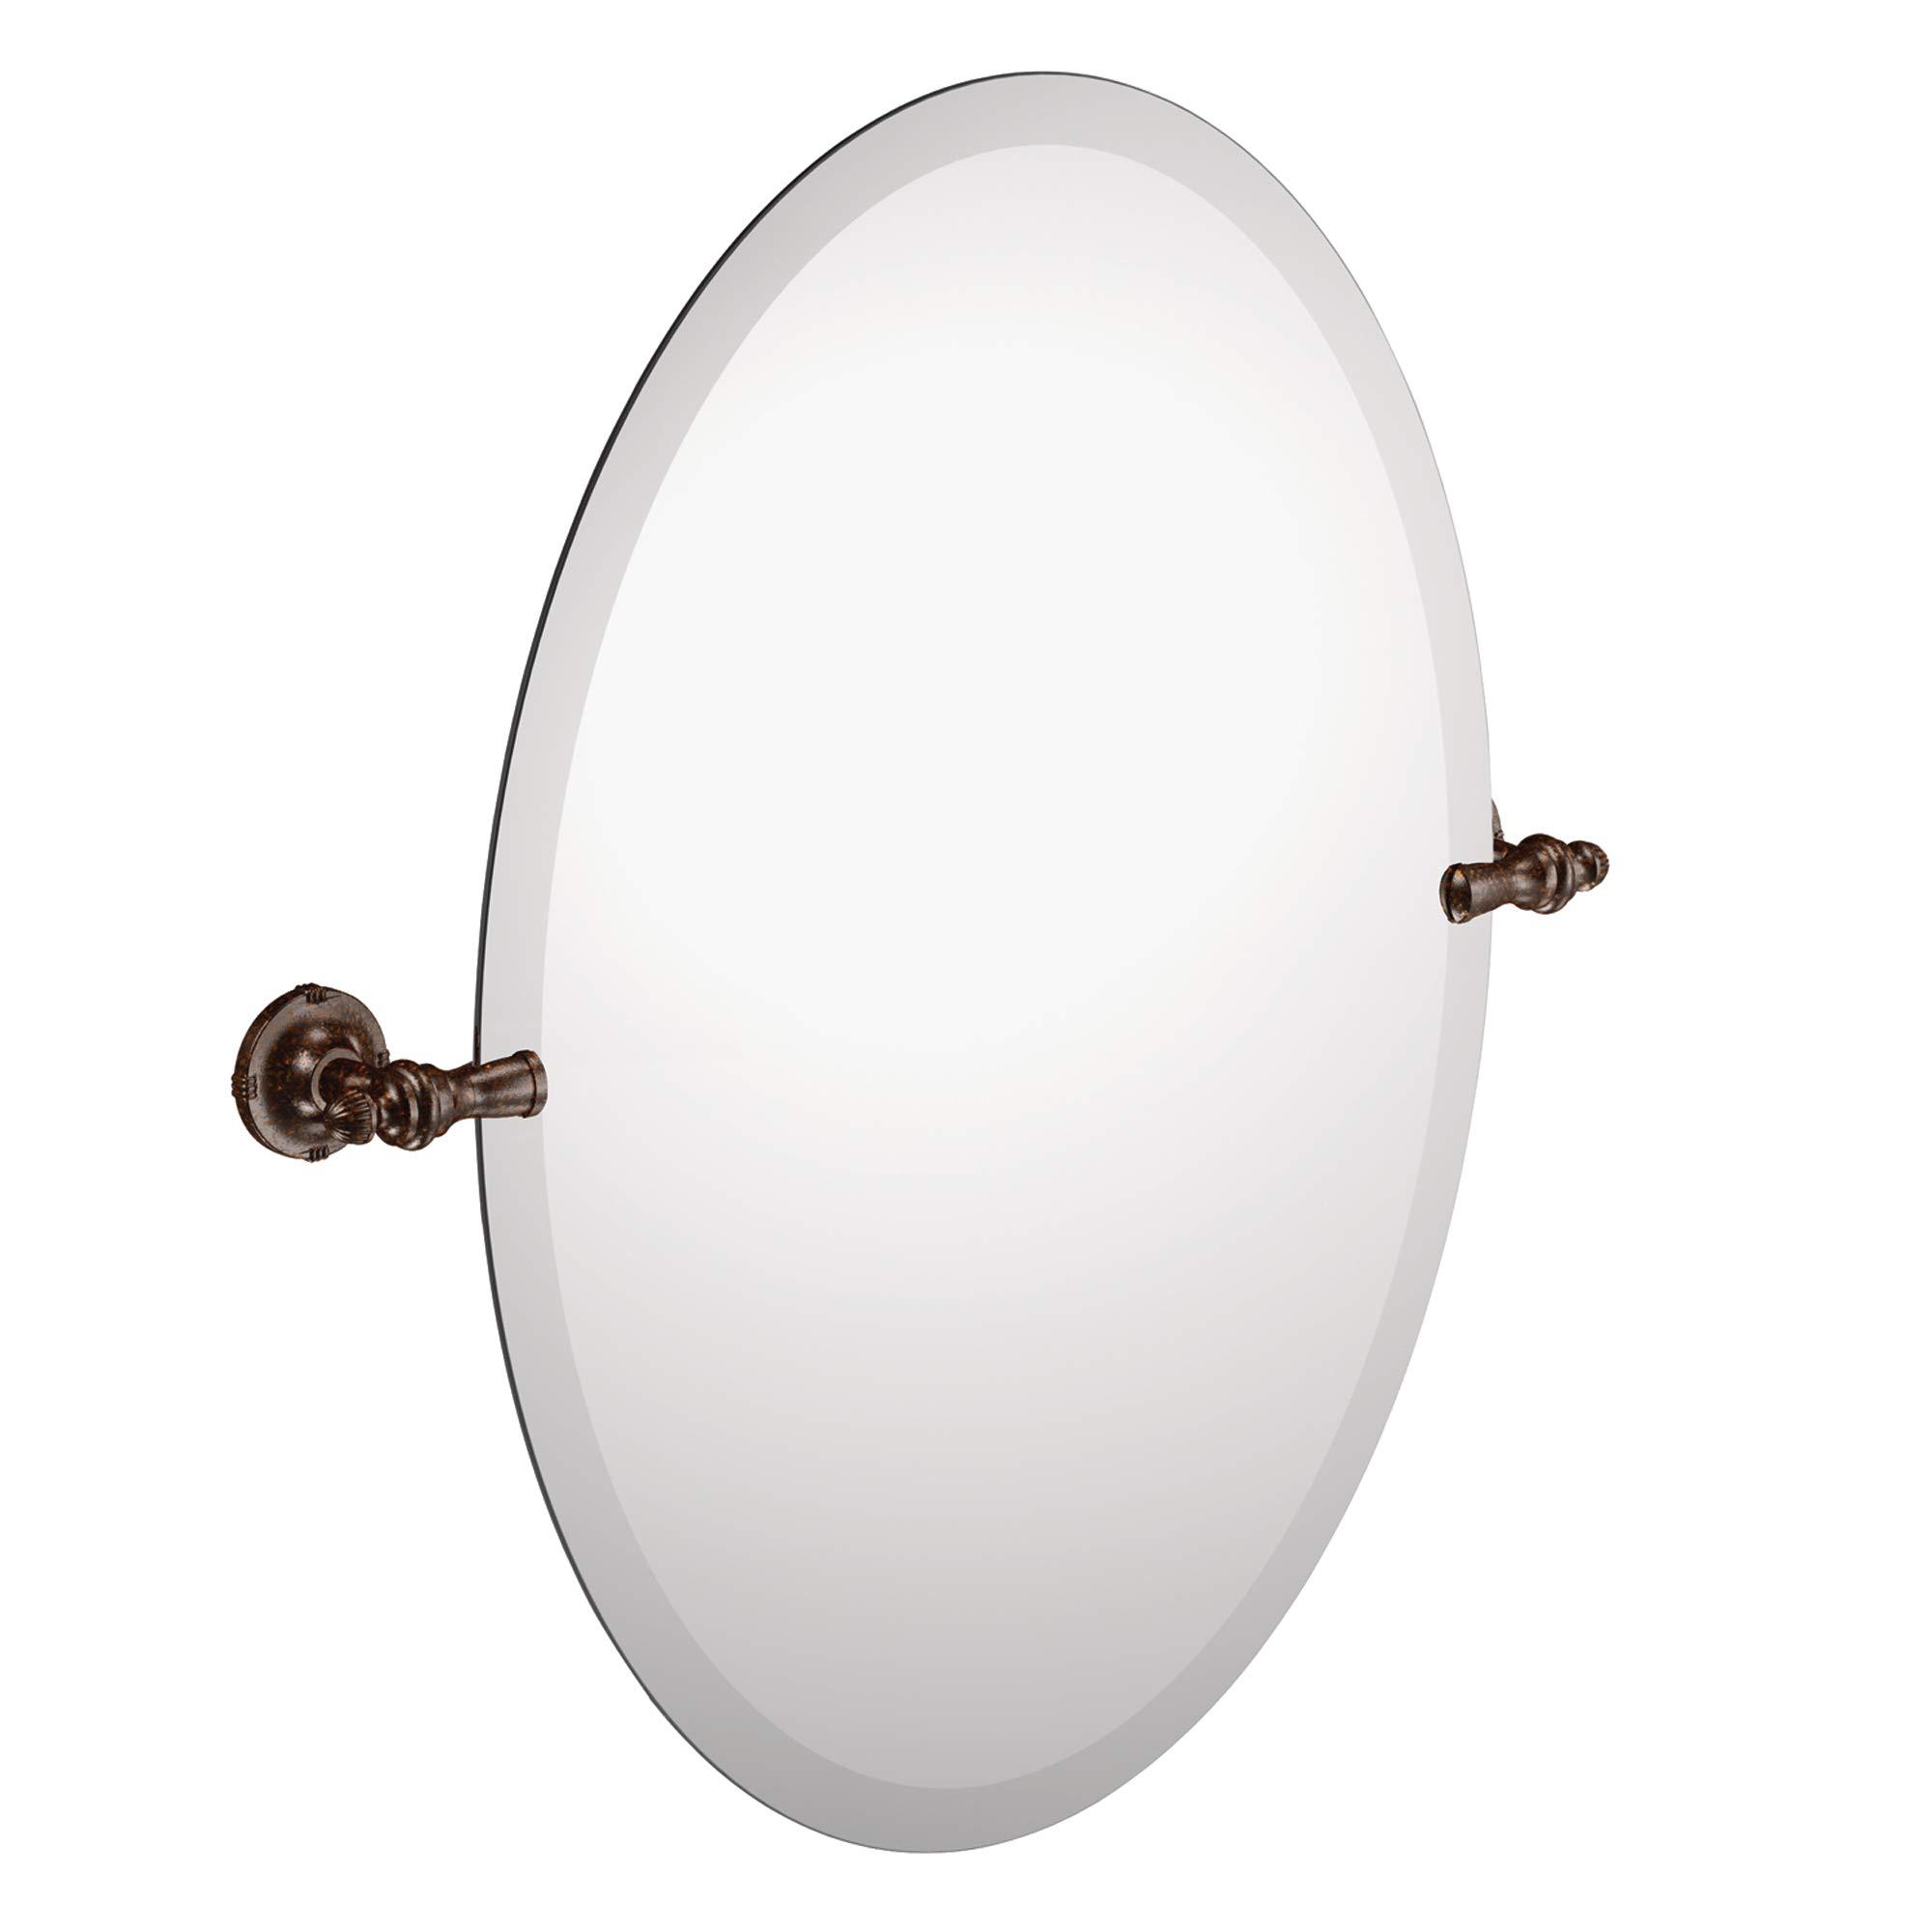 Moen DN0892ORB Gilcrest 26-Inch x 23-Inch Frameless Pivoting Bathroom Tilting Mirror, Oil Rubbed Bronze by Moen